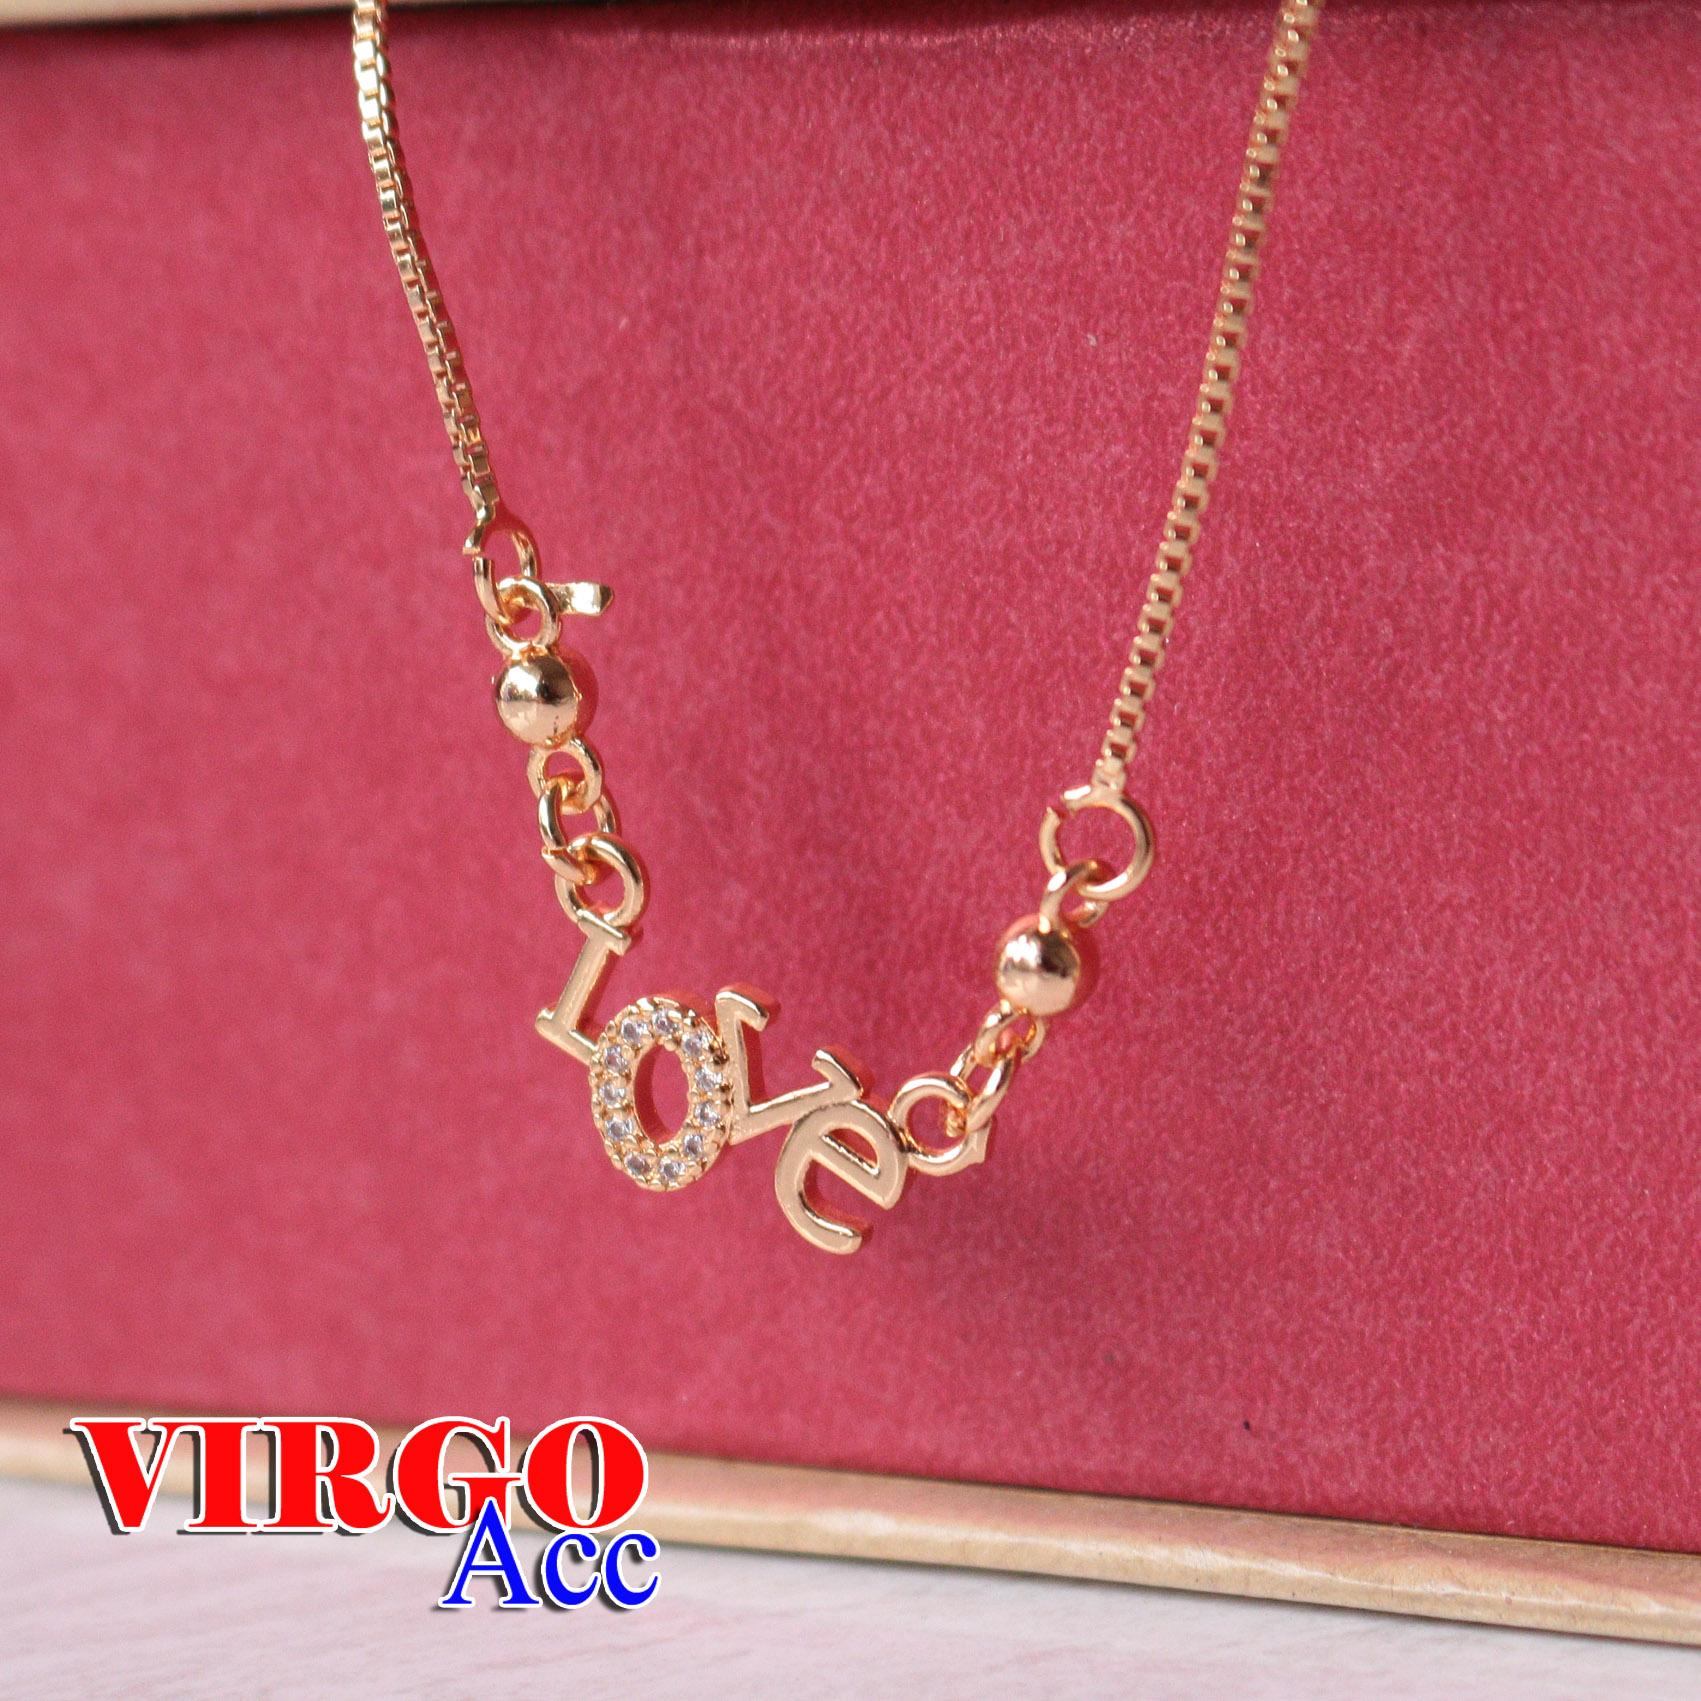 acc cod- kalung wanita xuping gold itali liontin love permata kunci langsung anti luntur 24k new